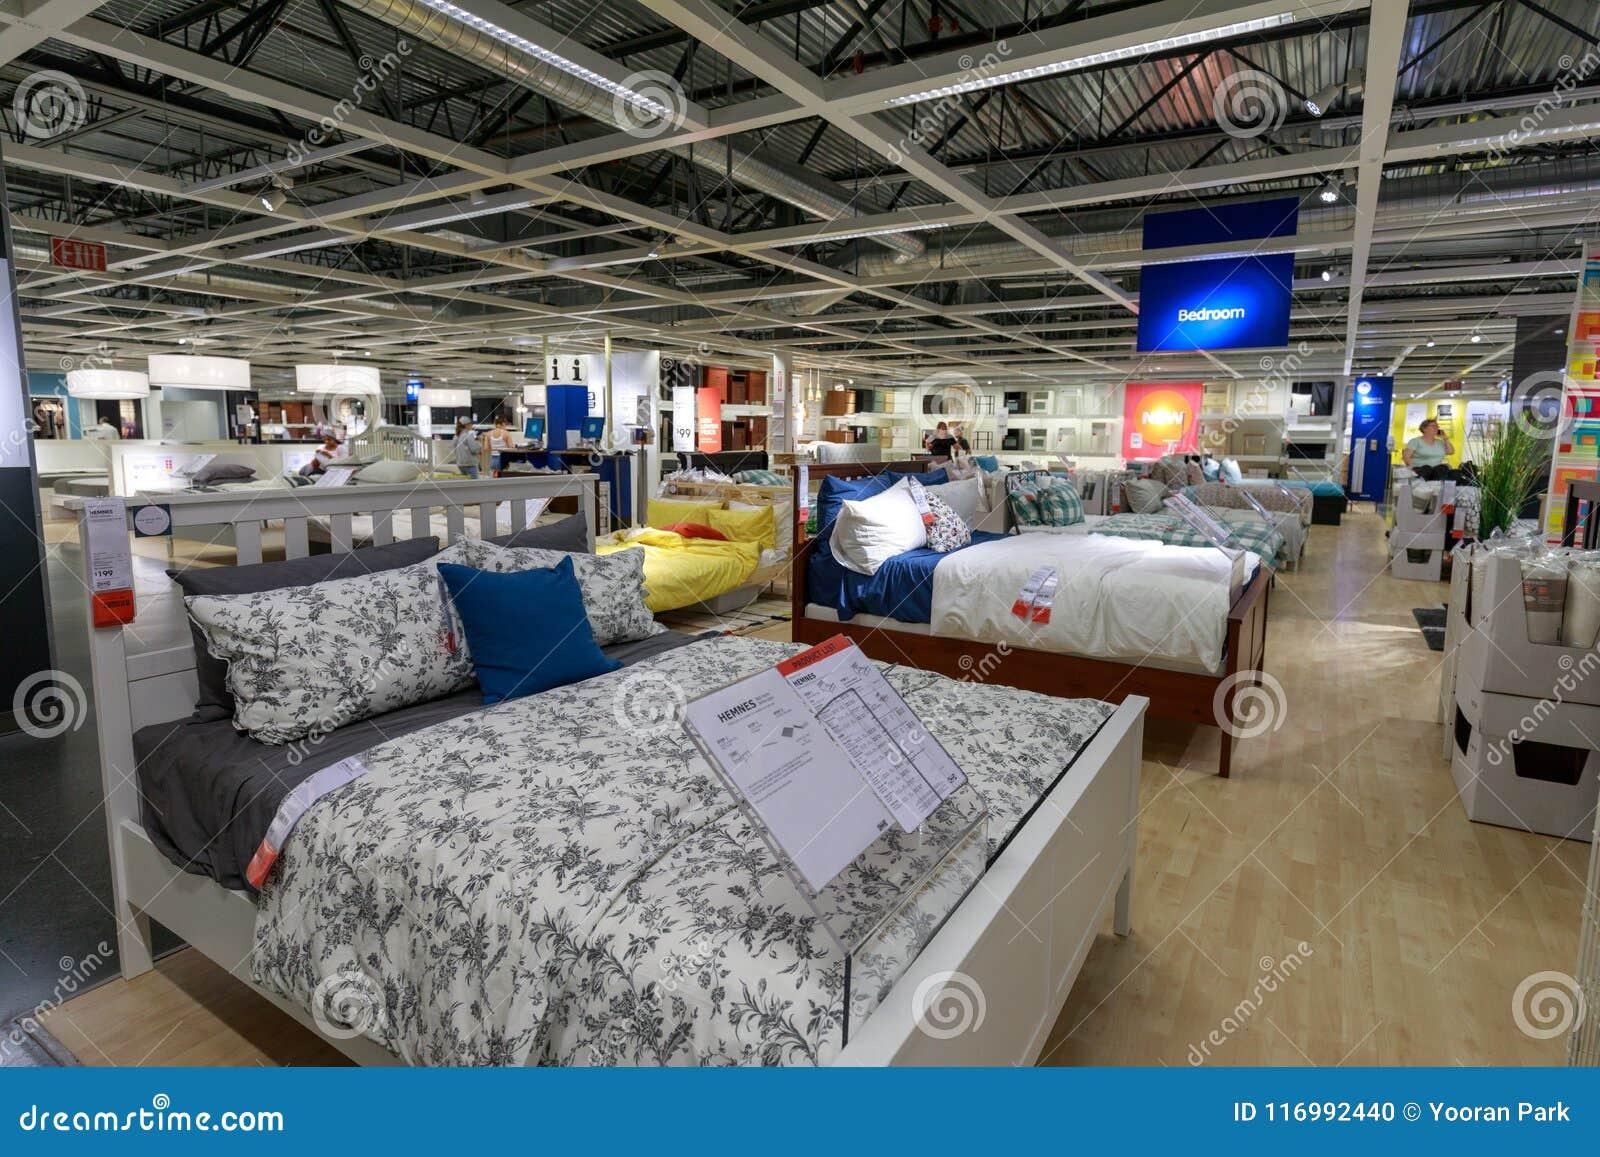 Interior Of The Ikea Store In Portland, Oregon. IKEA Is The ...